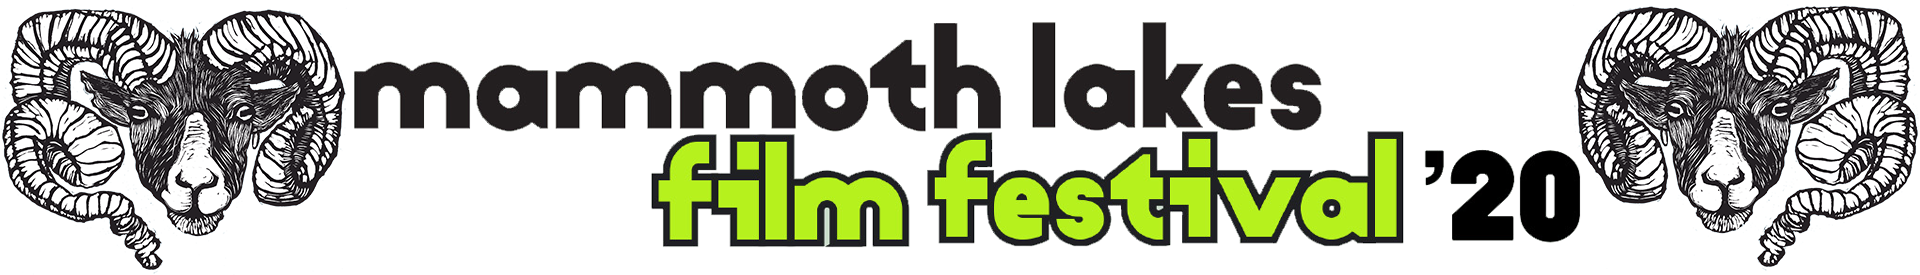 2020 Mammoth Lakes Film Festival